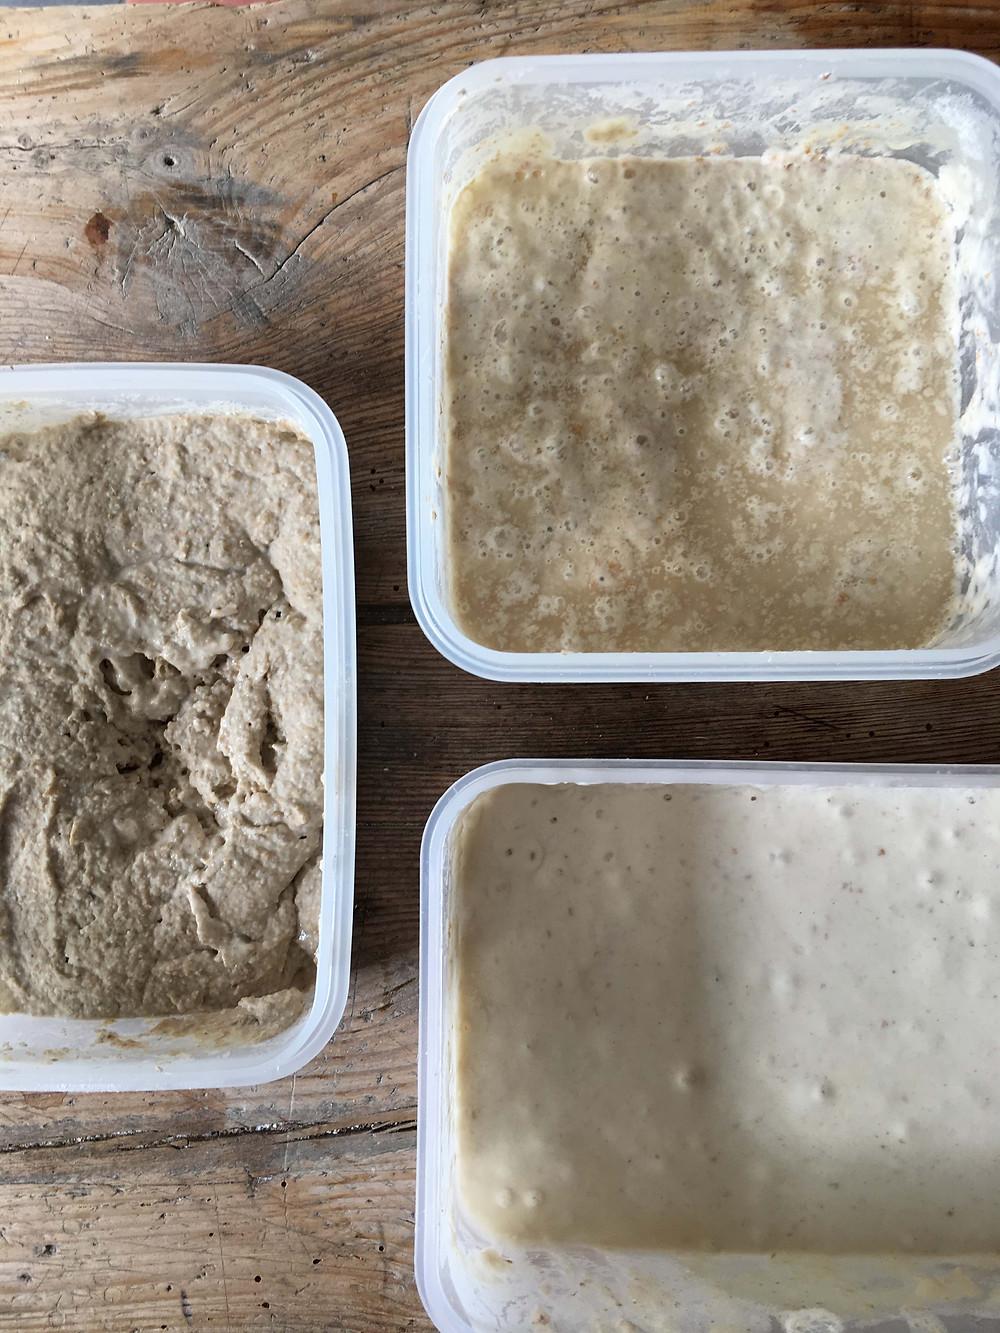 Three sourdough starters: rye, white and spelt